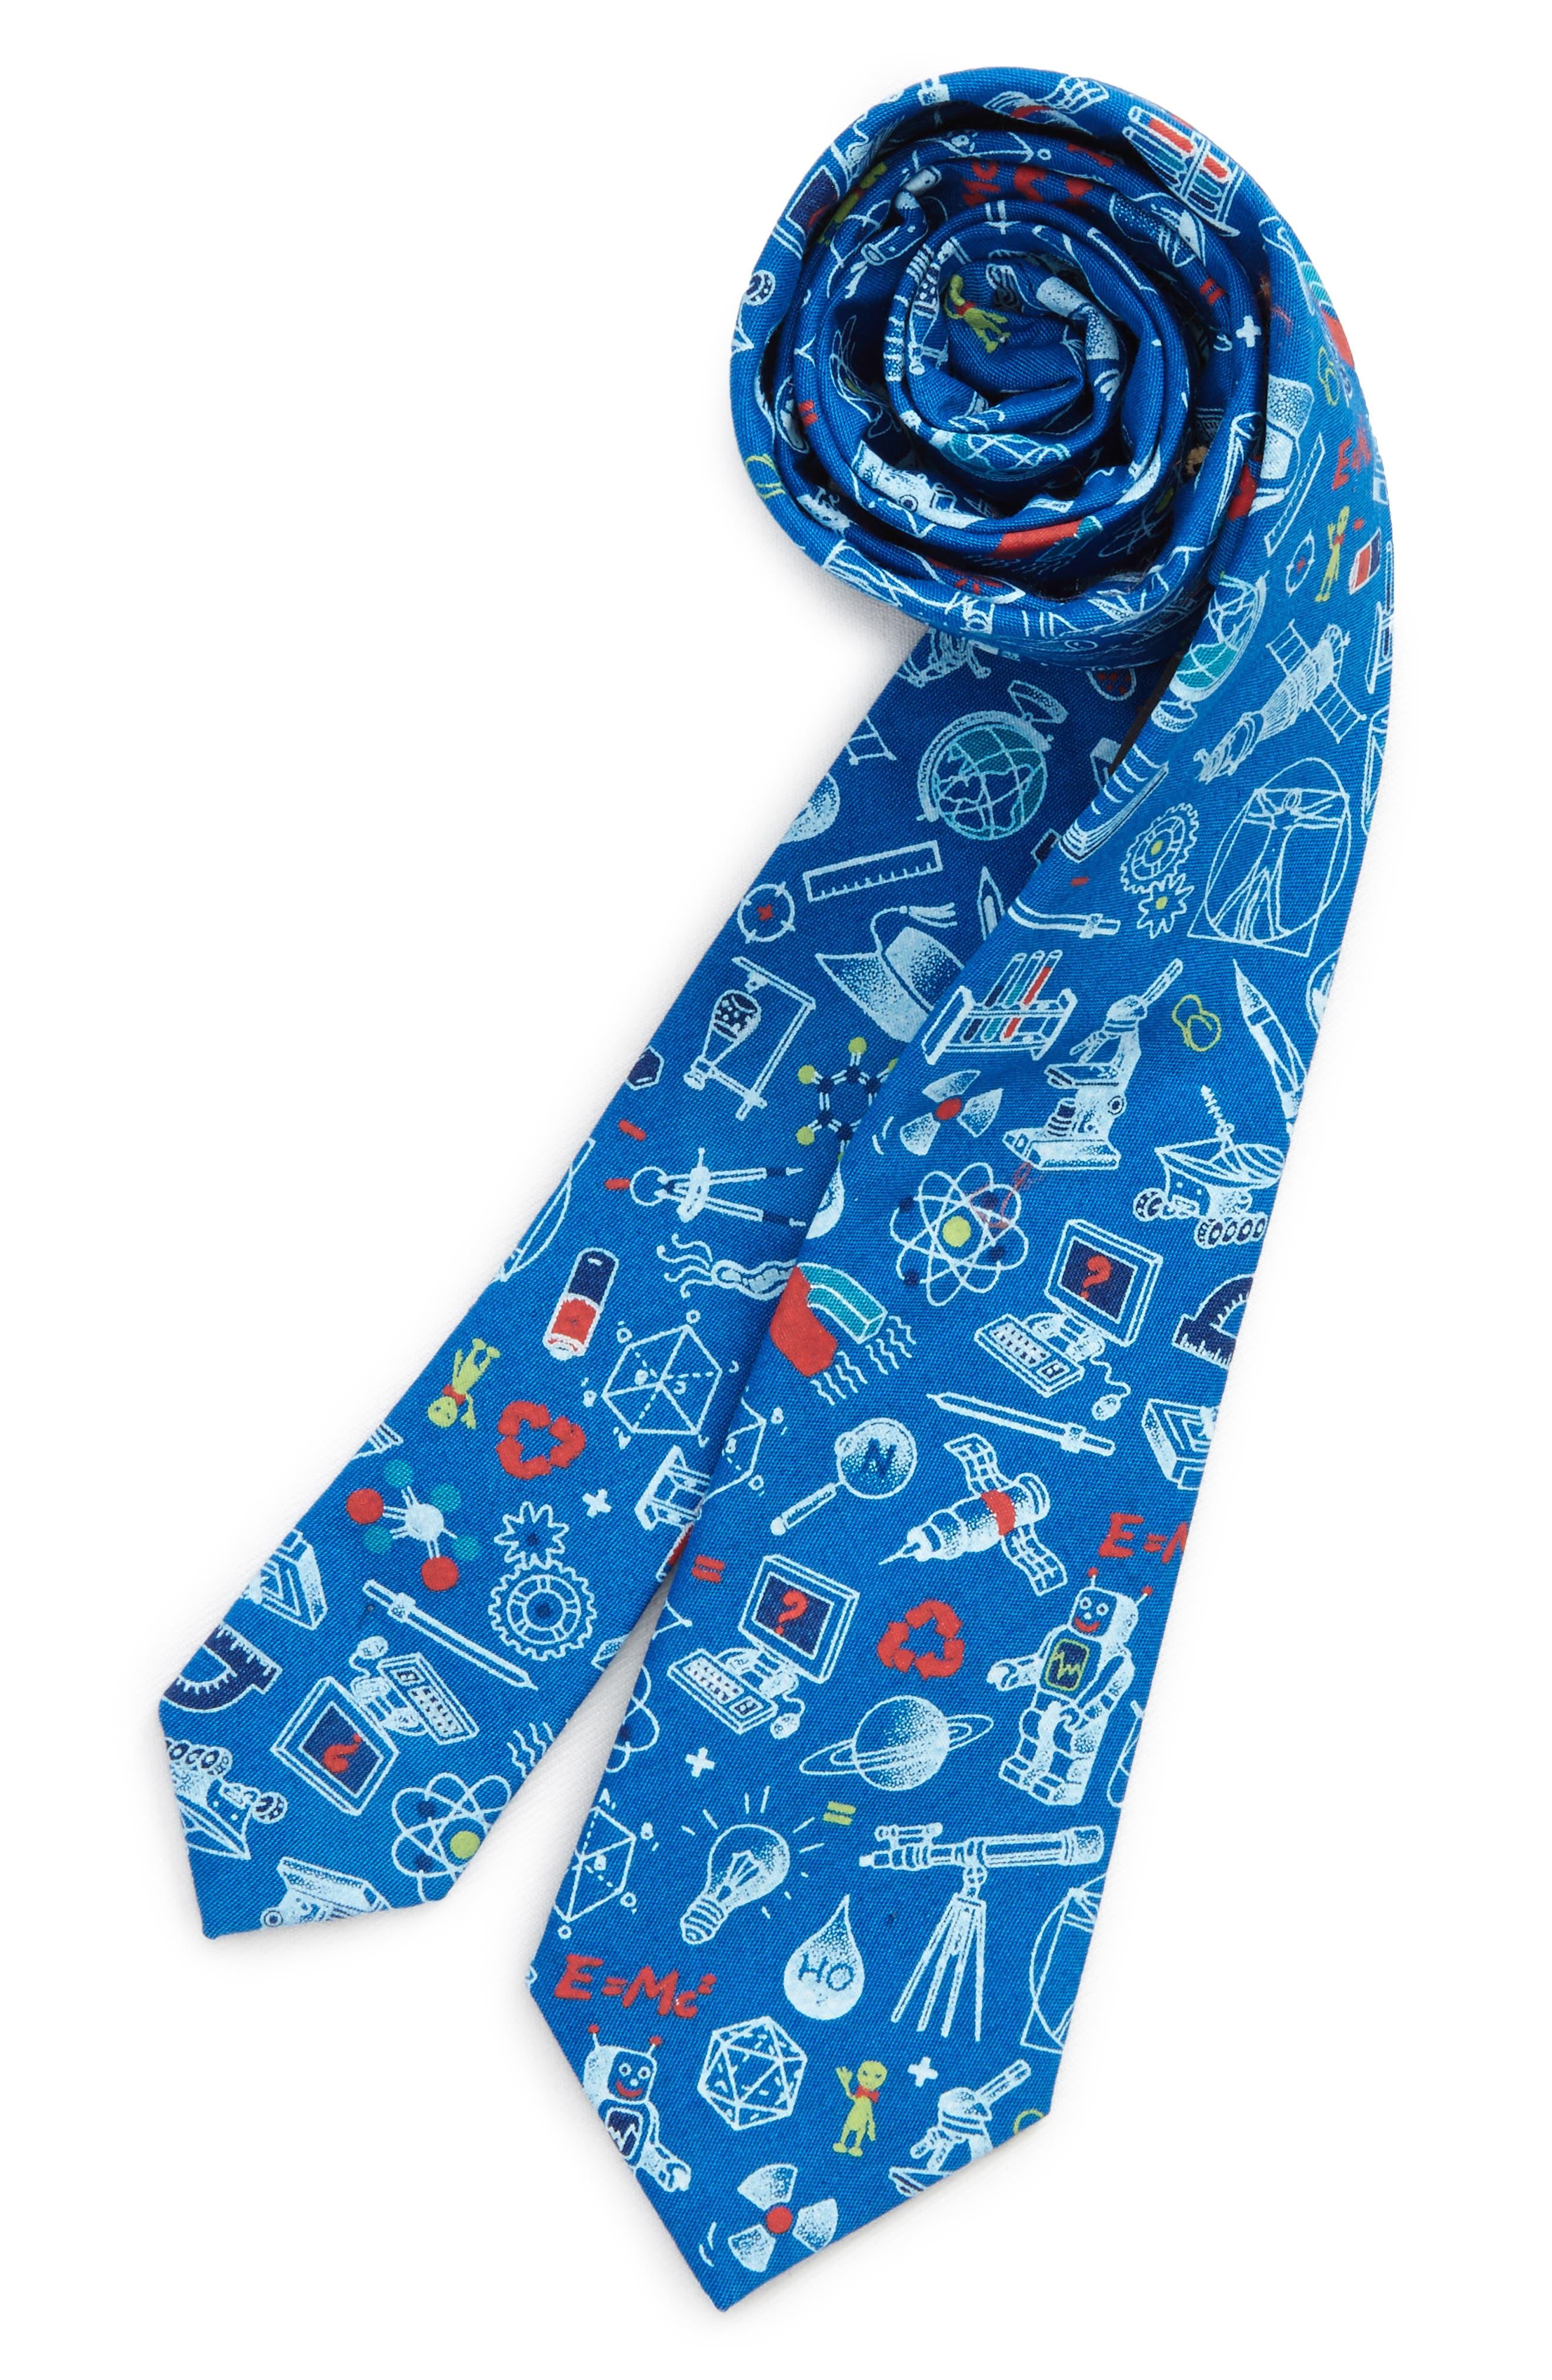 Main Image - Nordstrom Science Print Cotton Tie (Boys)